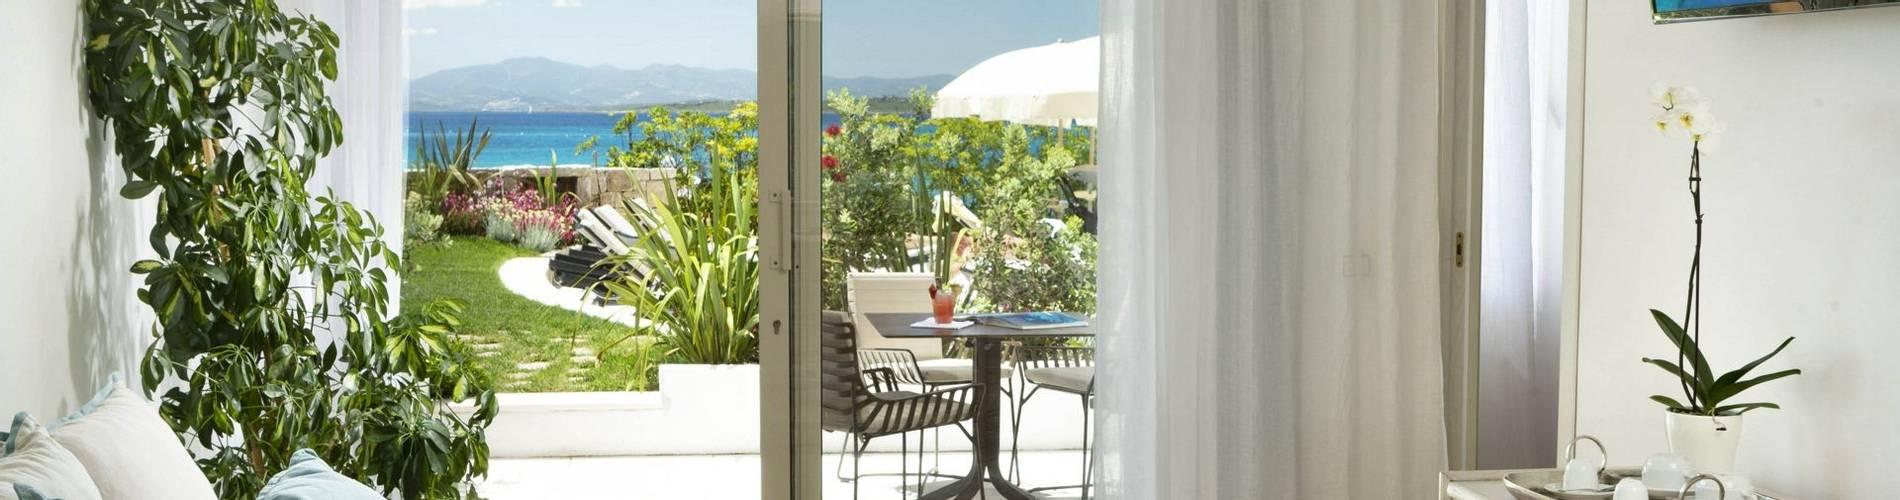 1 Charming Suite - Gabbiano Azzurro Sardegna.jpg